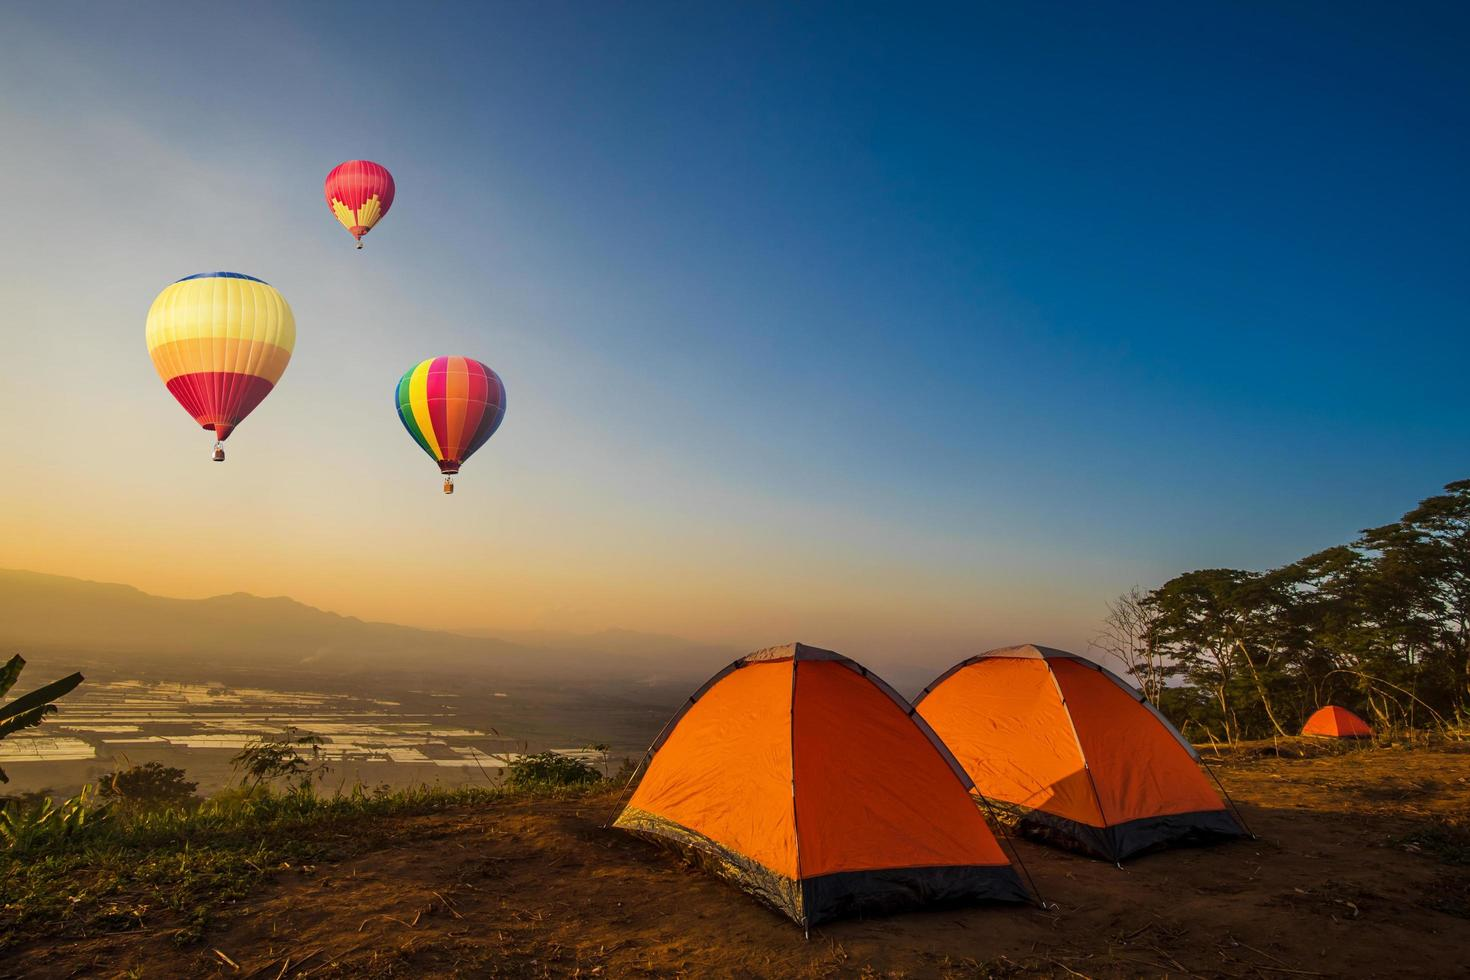 Hot air balloons flying near camping tents  photo